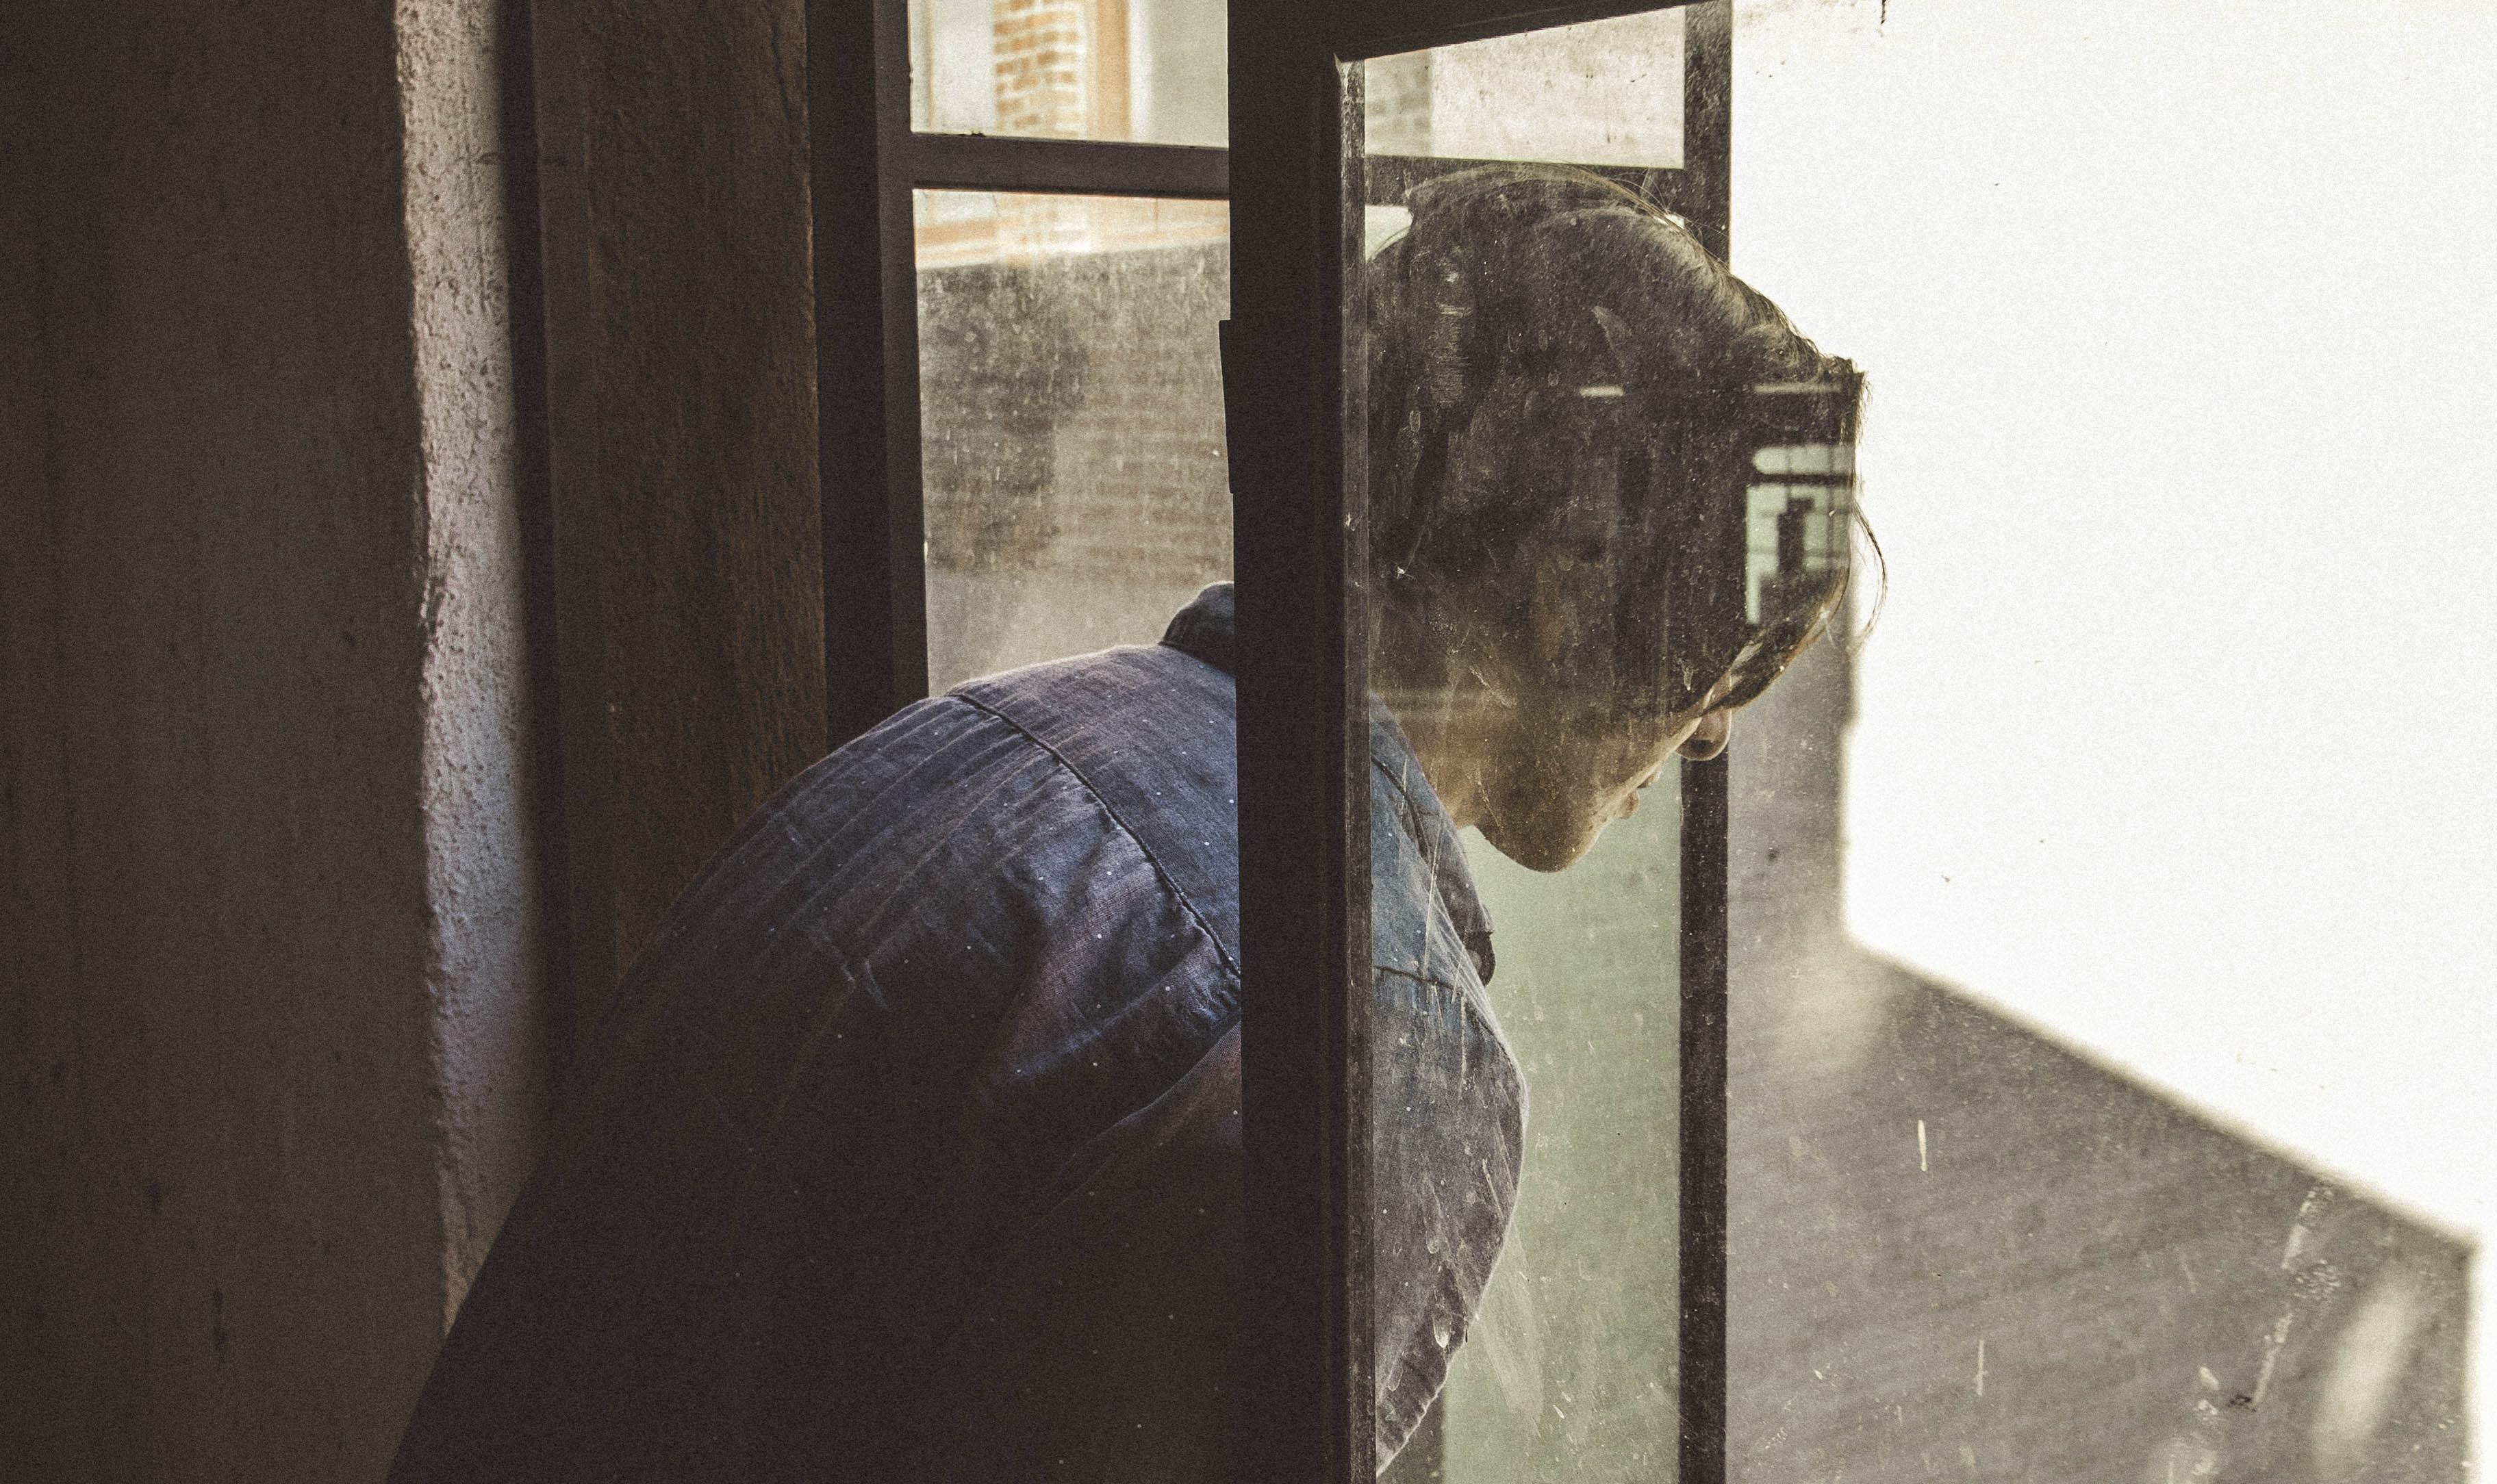 man staring on window